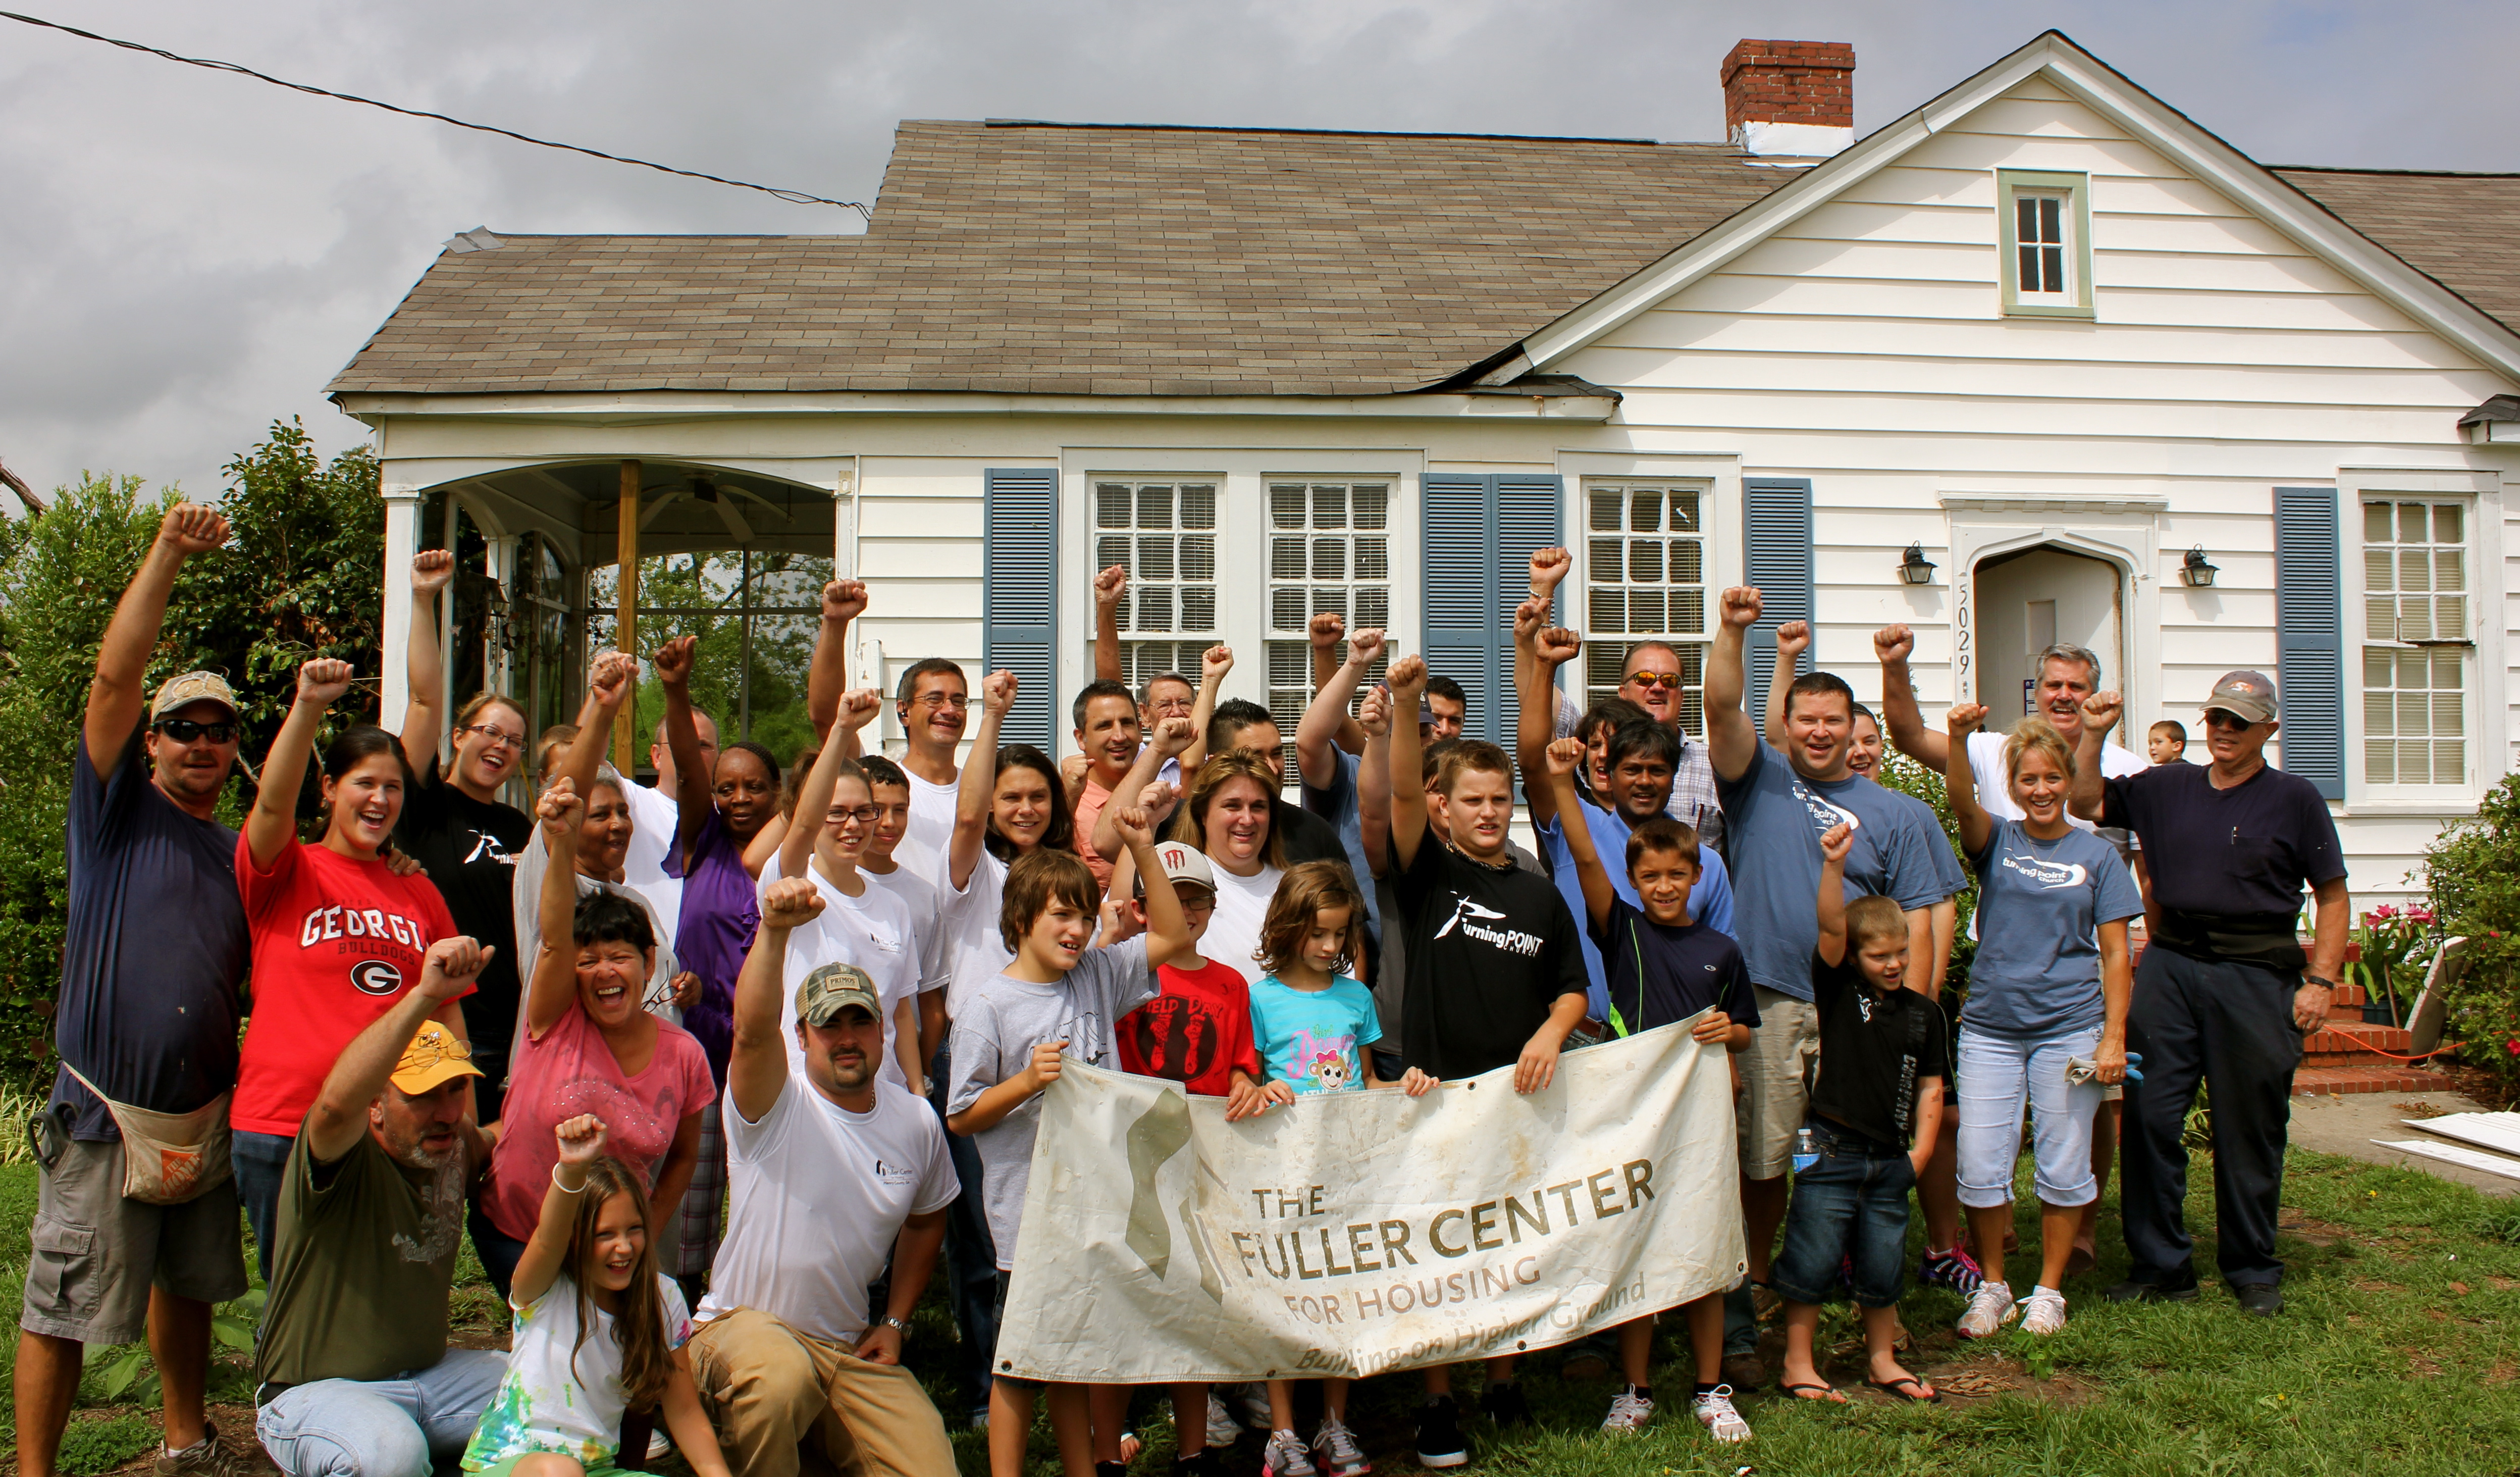 Georgia's FCH-Henry County to host 2012 Millard Fuller Legacy Build